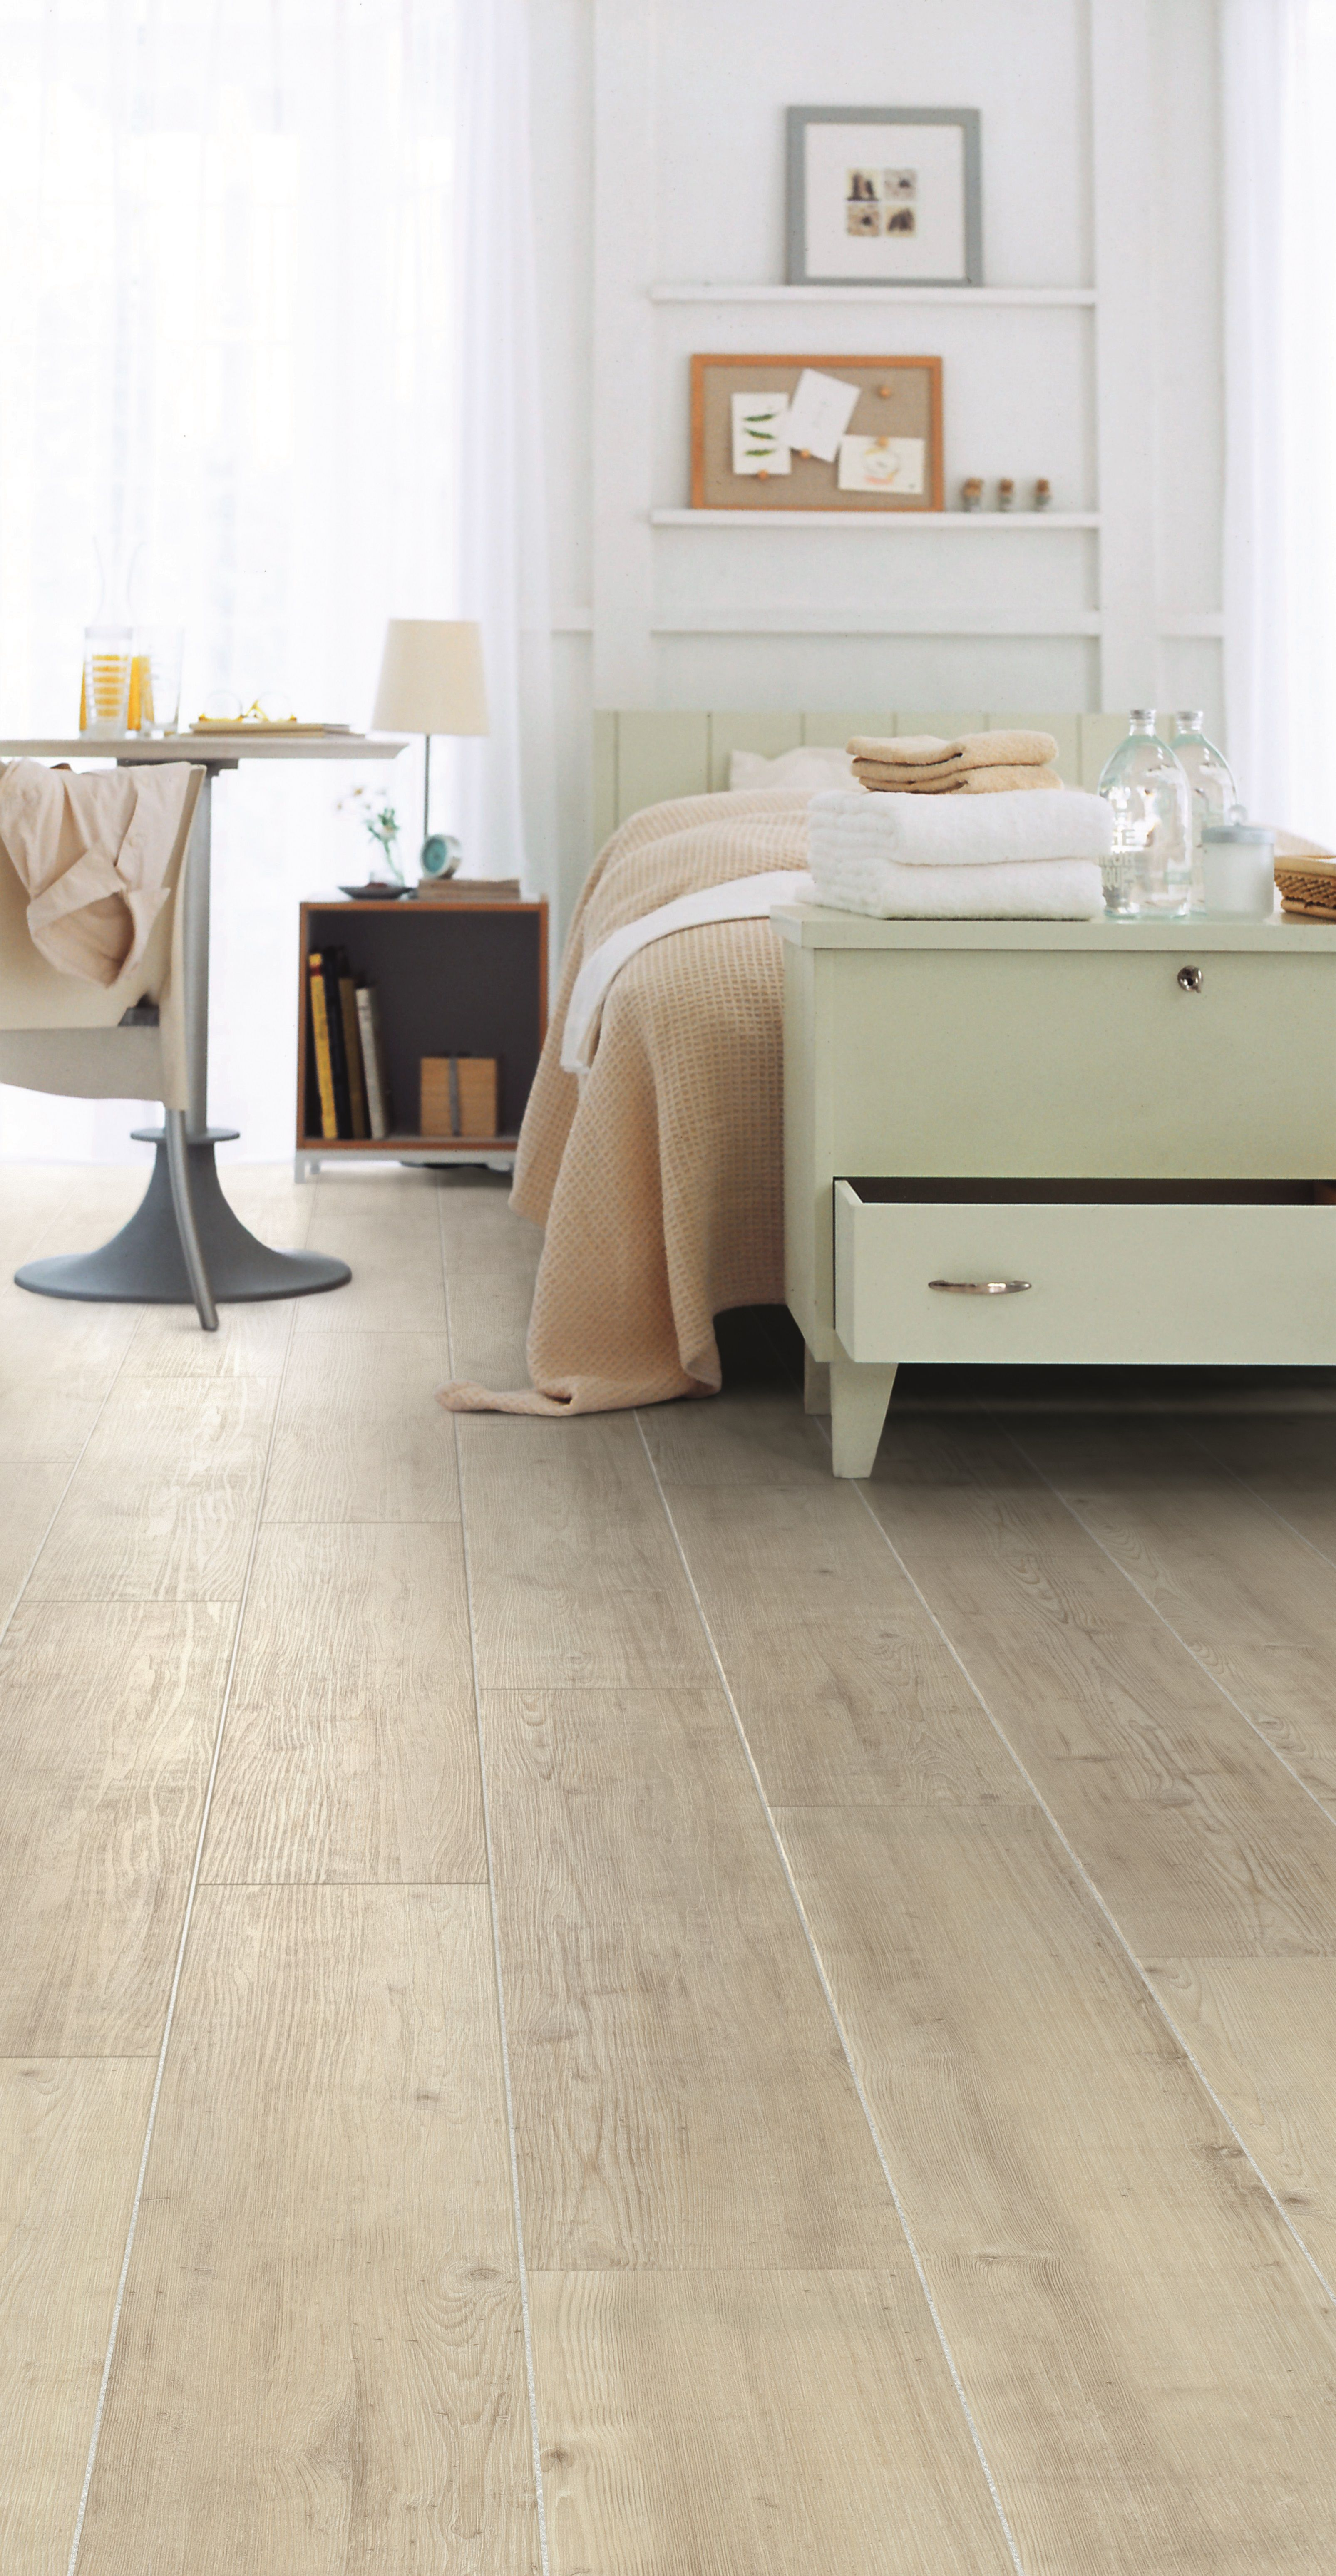 Fusion Flooring 1060 Royal White Oak light and spacious